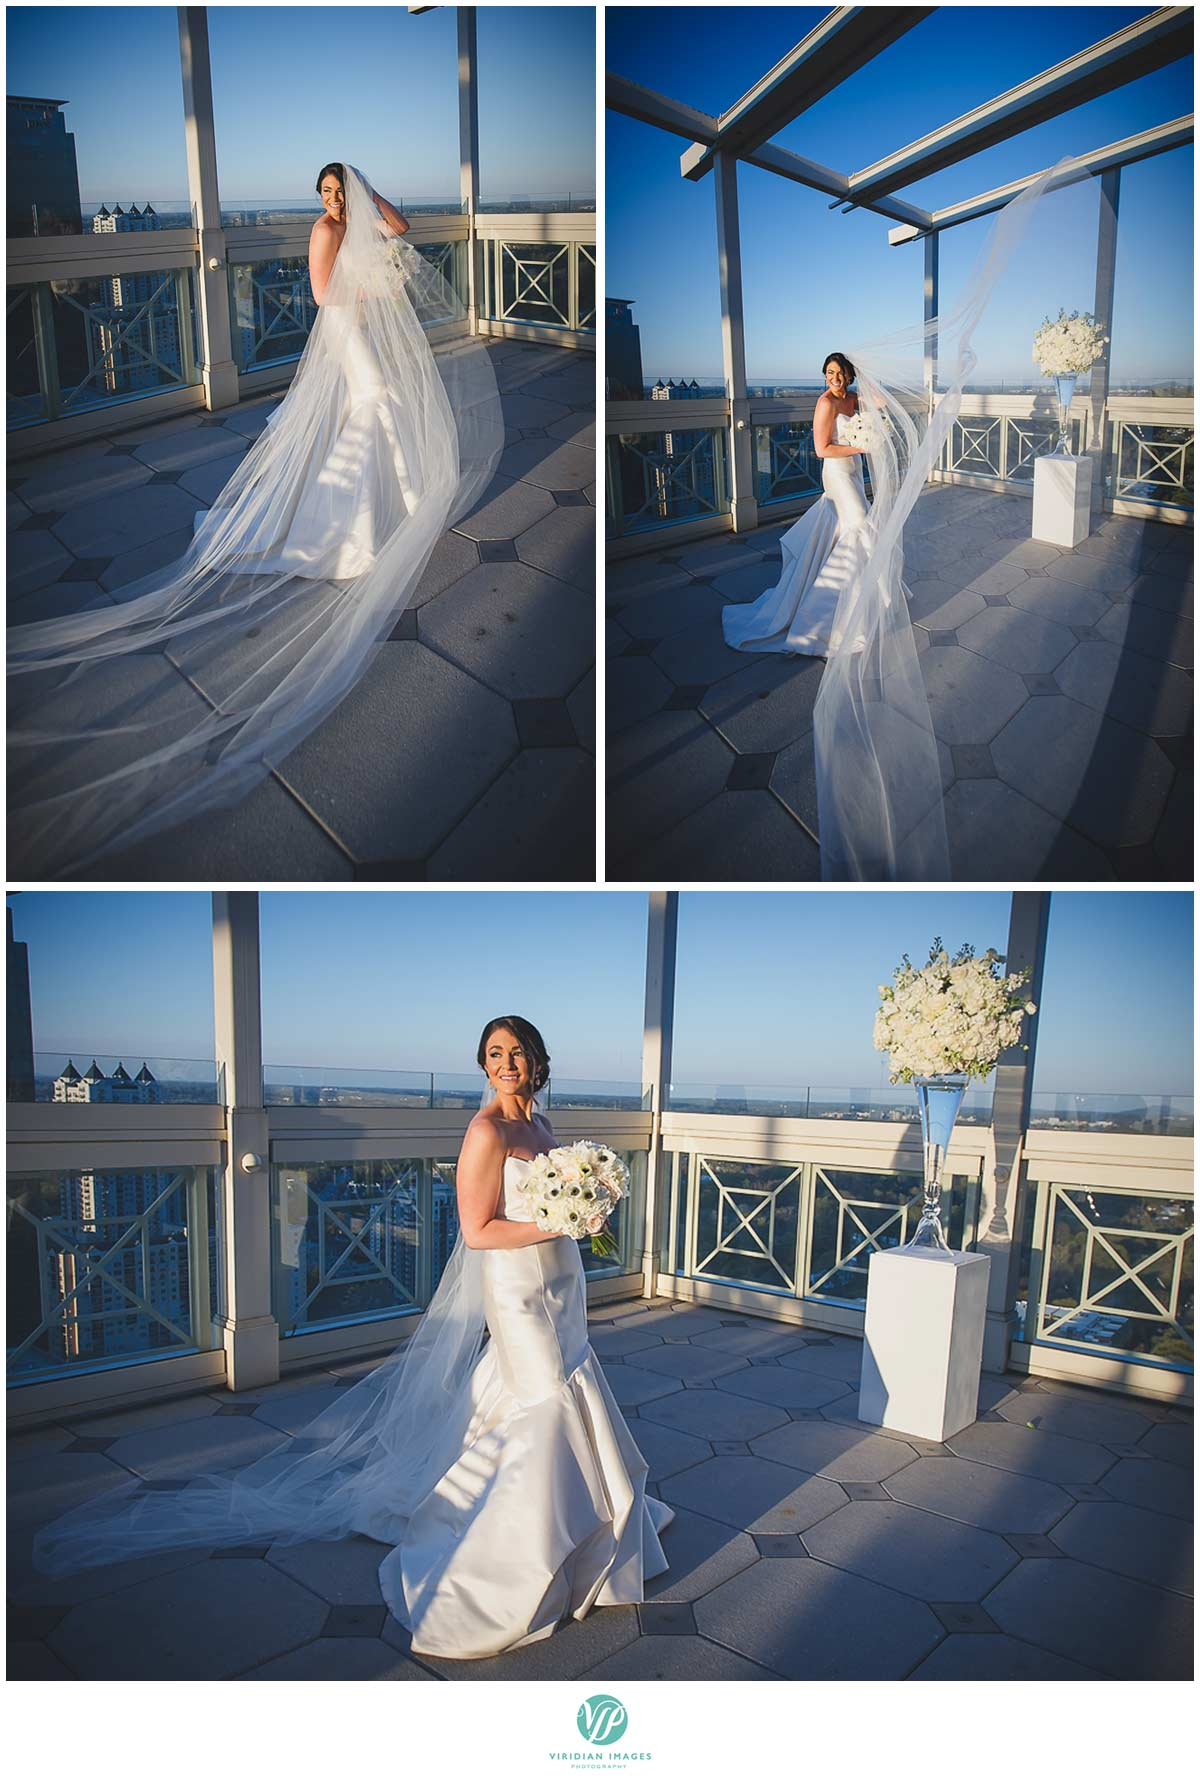 Peachtree_Club_Atlanta_Wedding_Viridian_Images_Photography-29